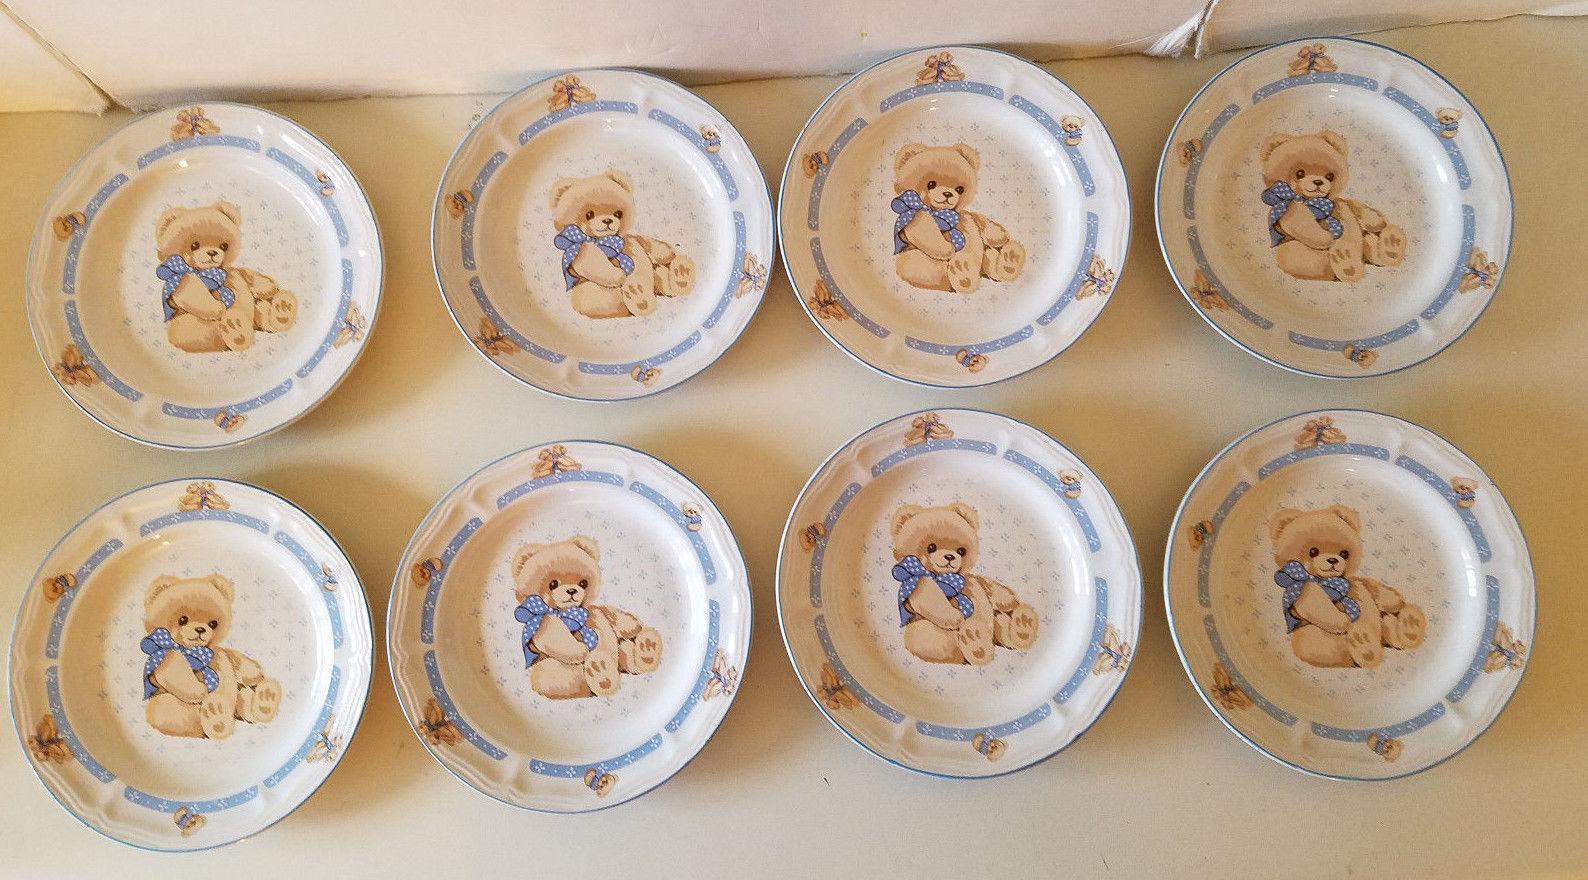 8 Tienshan Theodore Country Bear Stoneware Salad / Dessert Plates - 7 1/2  & 8 Tienshan Theodore Country Bear Stoneware and 18 similar items